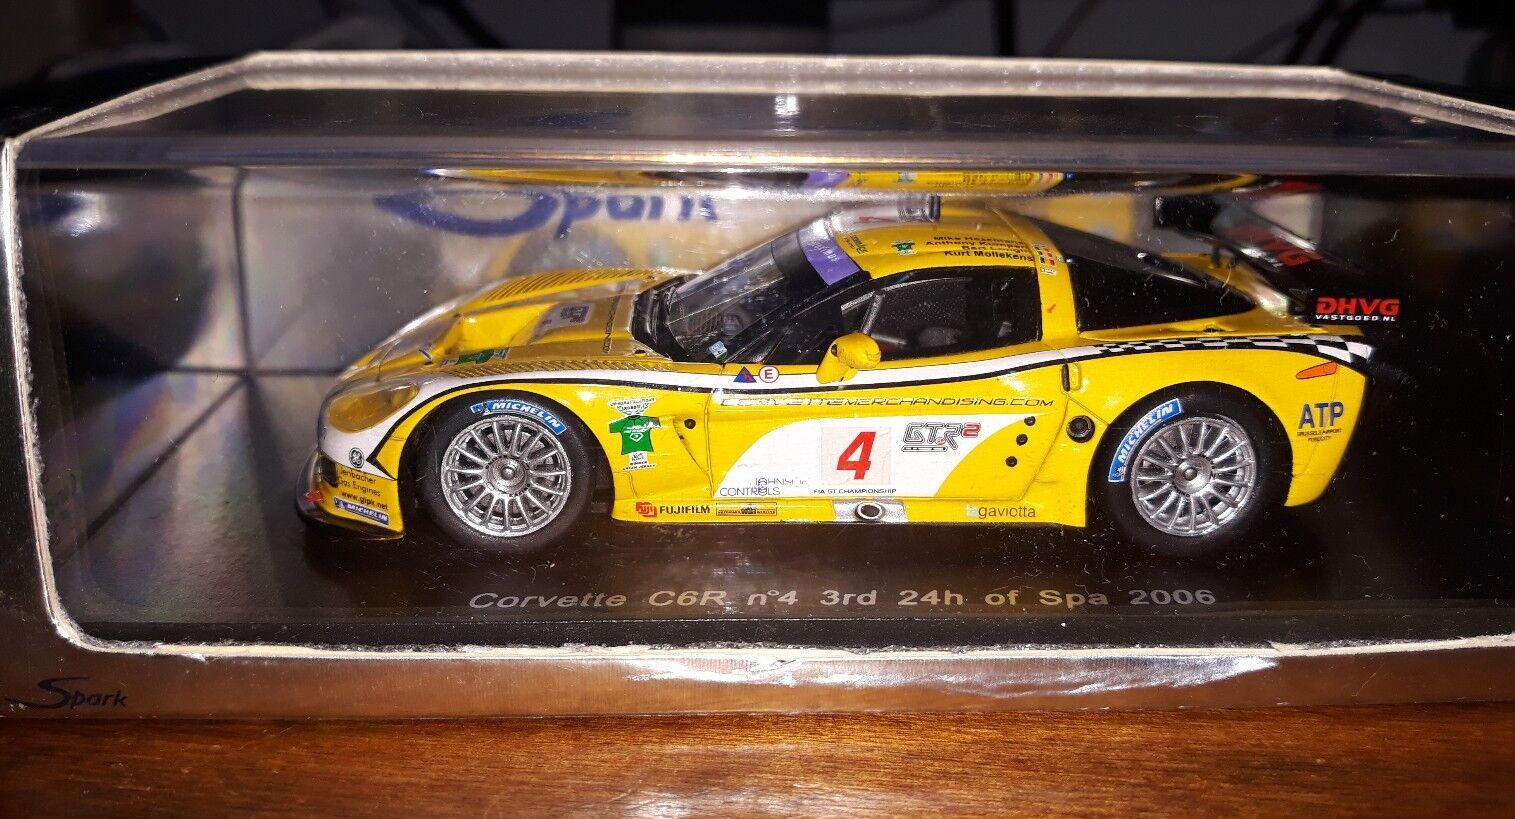 Spark 1 43 Corvette C6R C6R C6R  4 3rd 24 hours of Spa 2006 S0176 e22bca